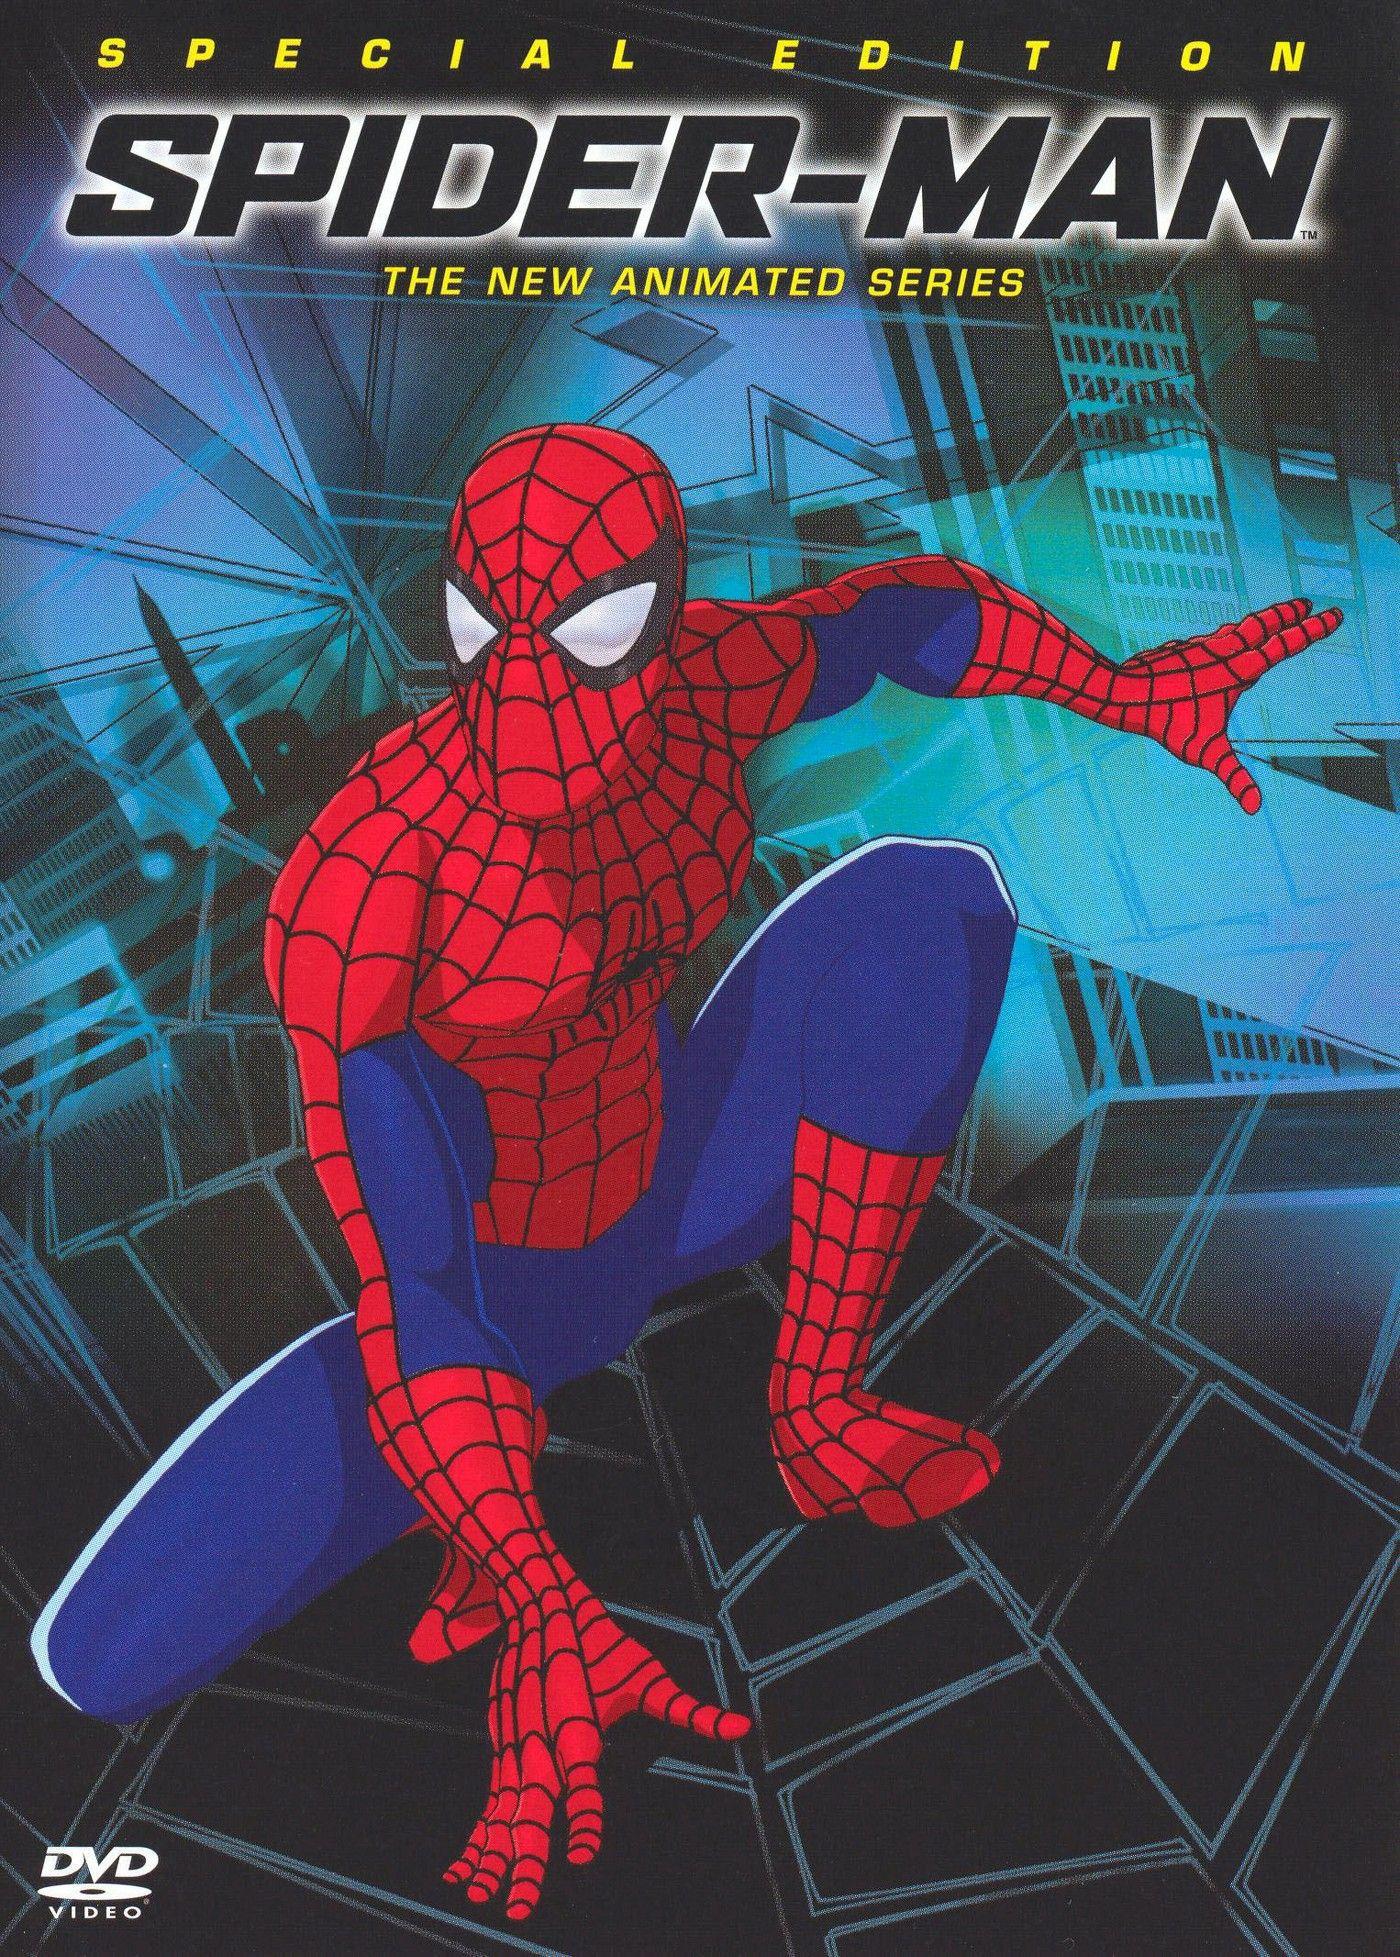 Spider Man The New Animated Series Season 1 Dvd 2004 Spiderman Spider Man Animated Series Spiderman Movie